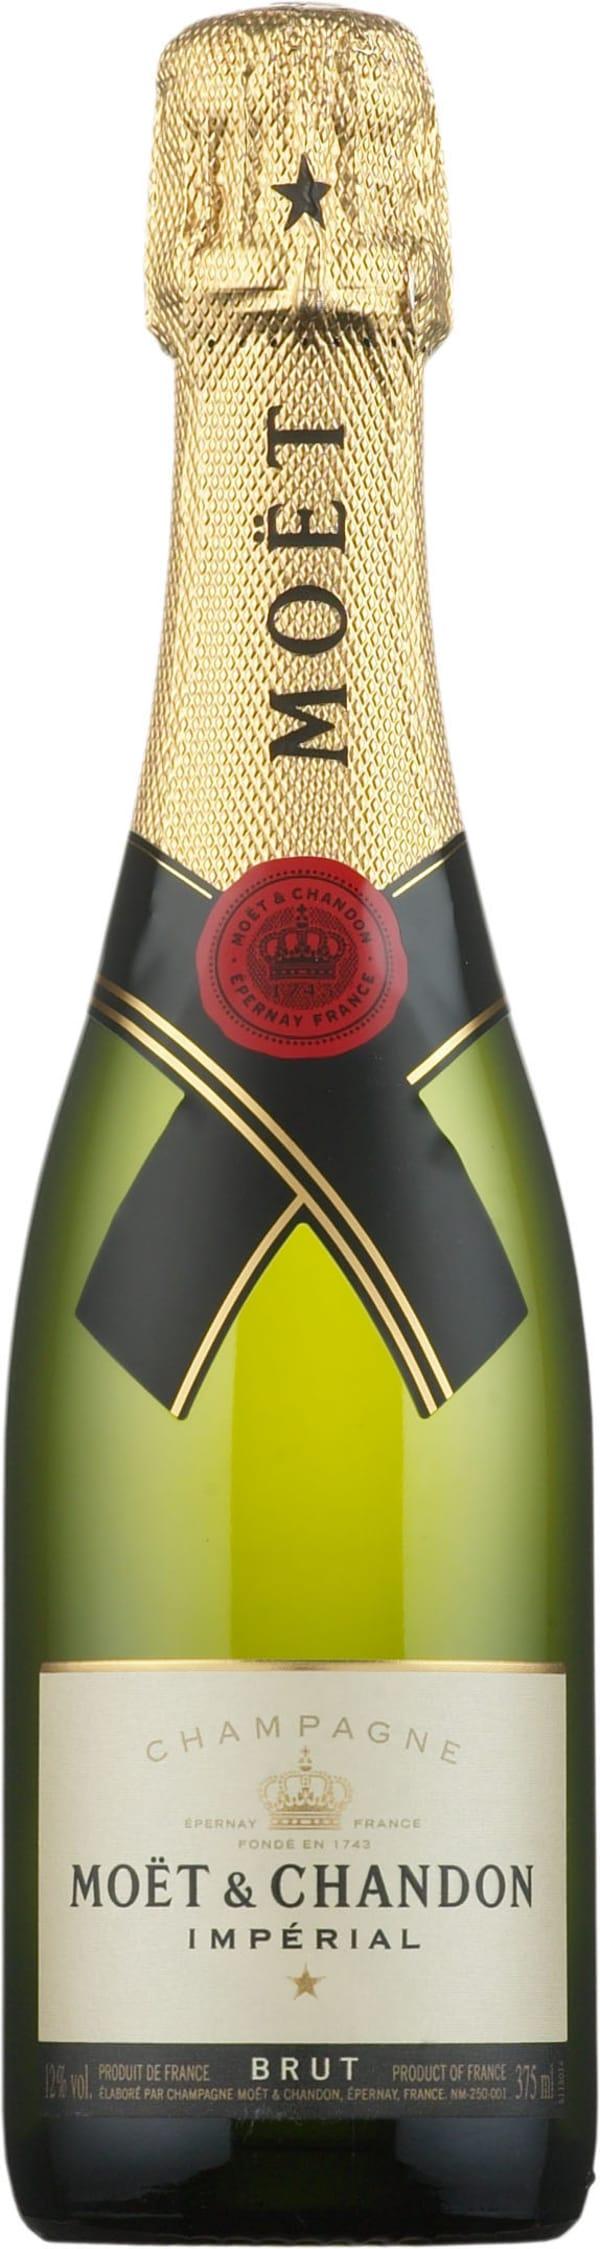 Moët & Chandon Impérial Champagne Brut